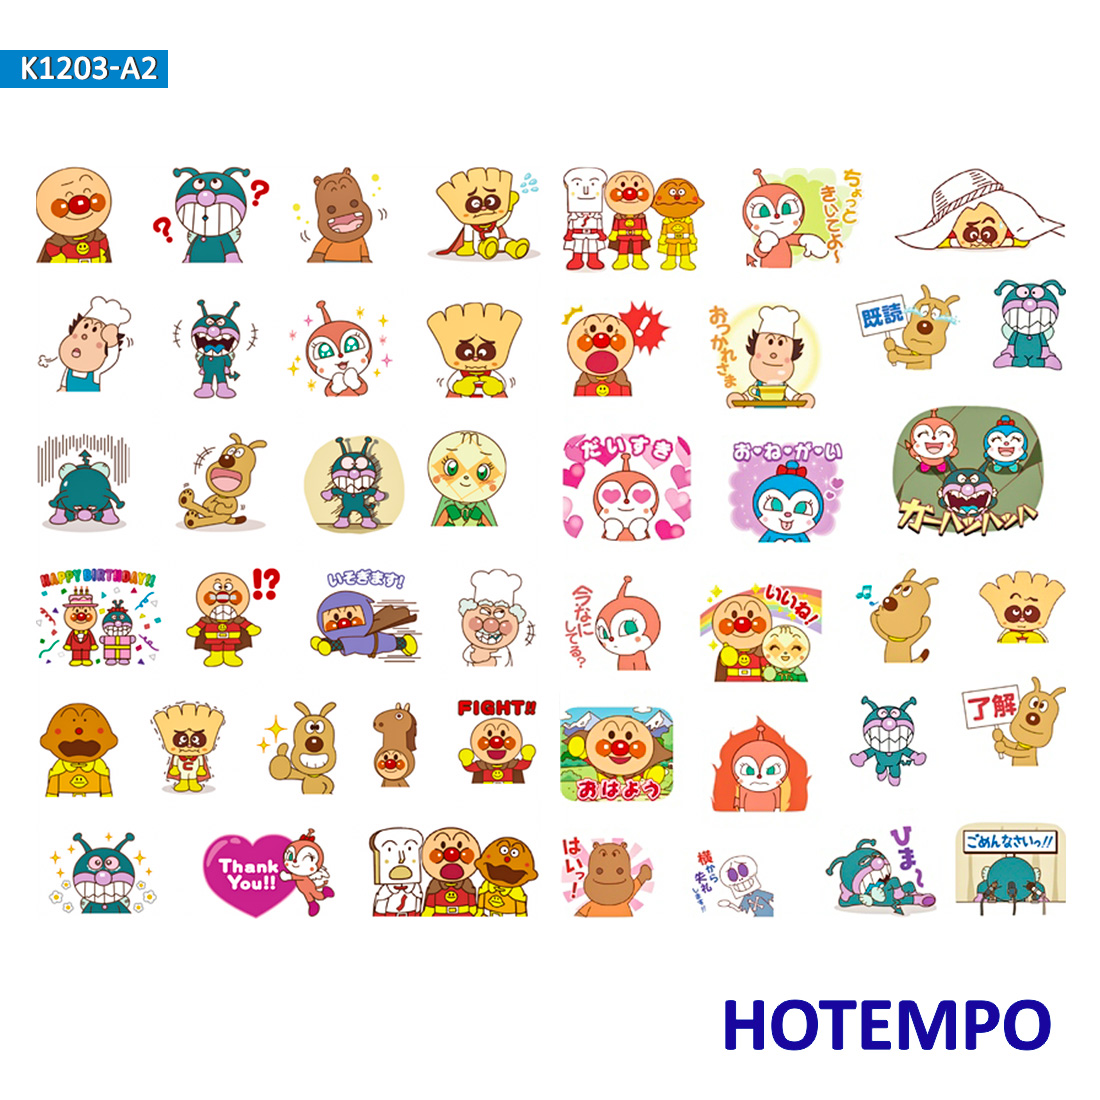 Anpanman Dokin-chan Baikinman Stickers For Girl Children Kids Gift DIY Letter Diary Scrapbooking Stationery Pegatinas  Stickers